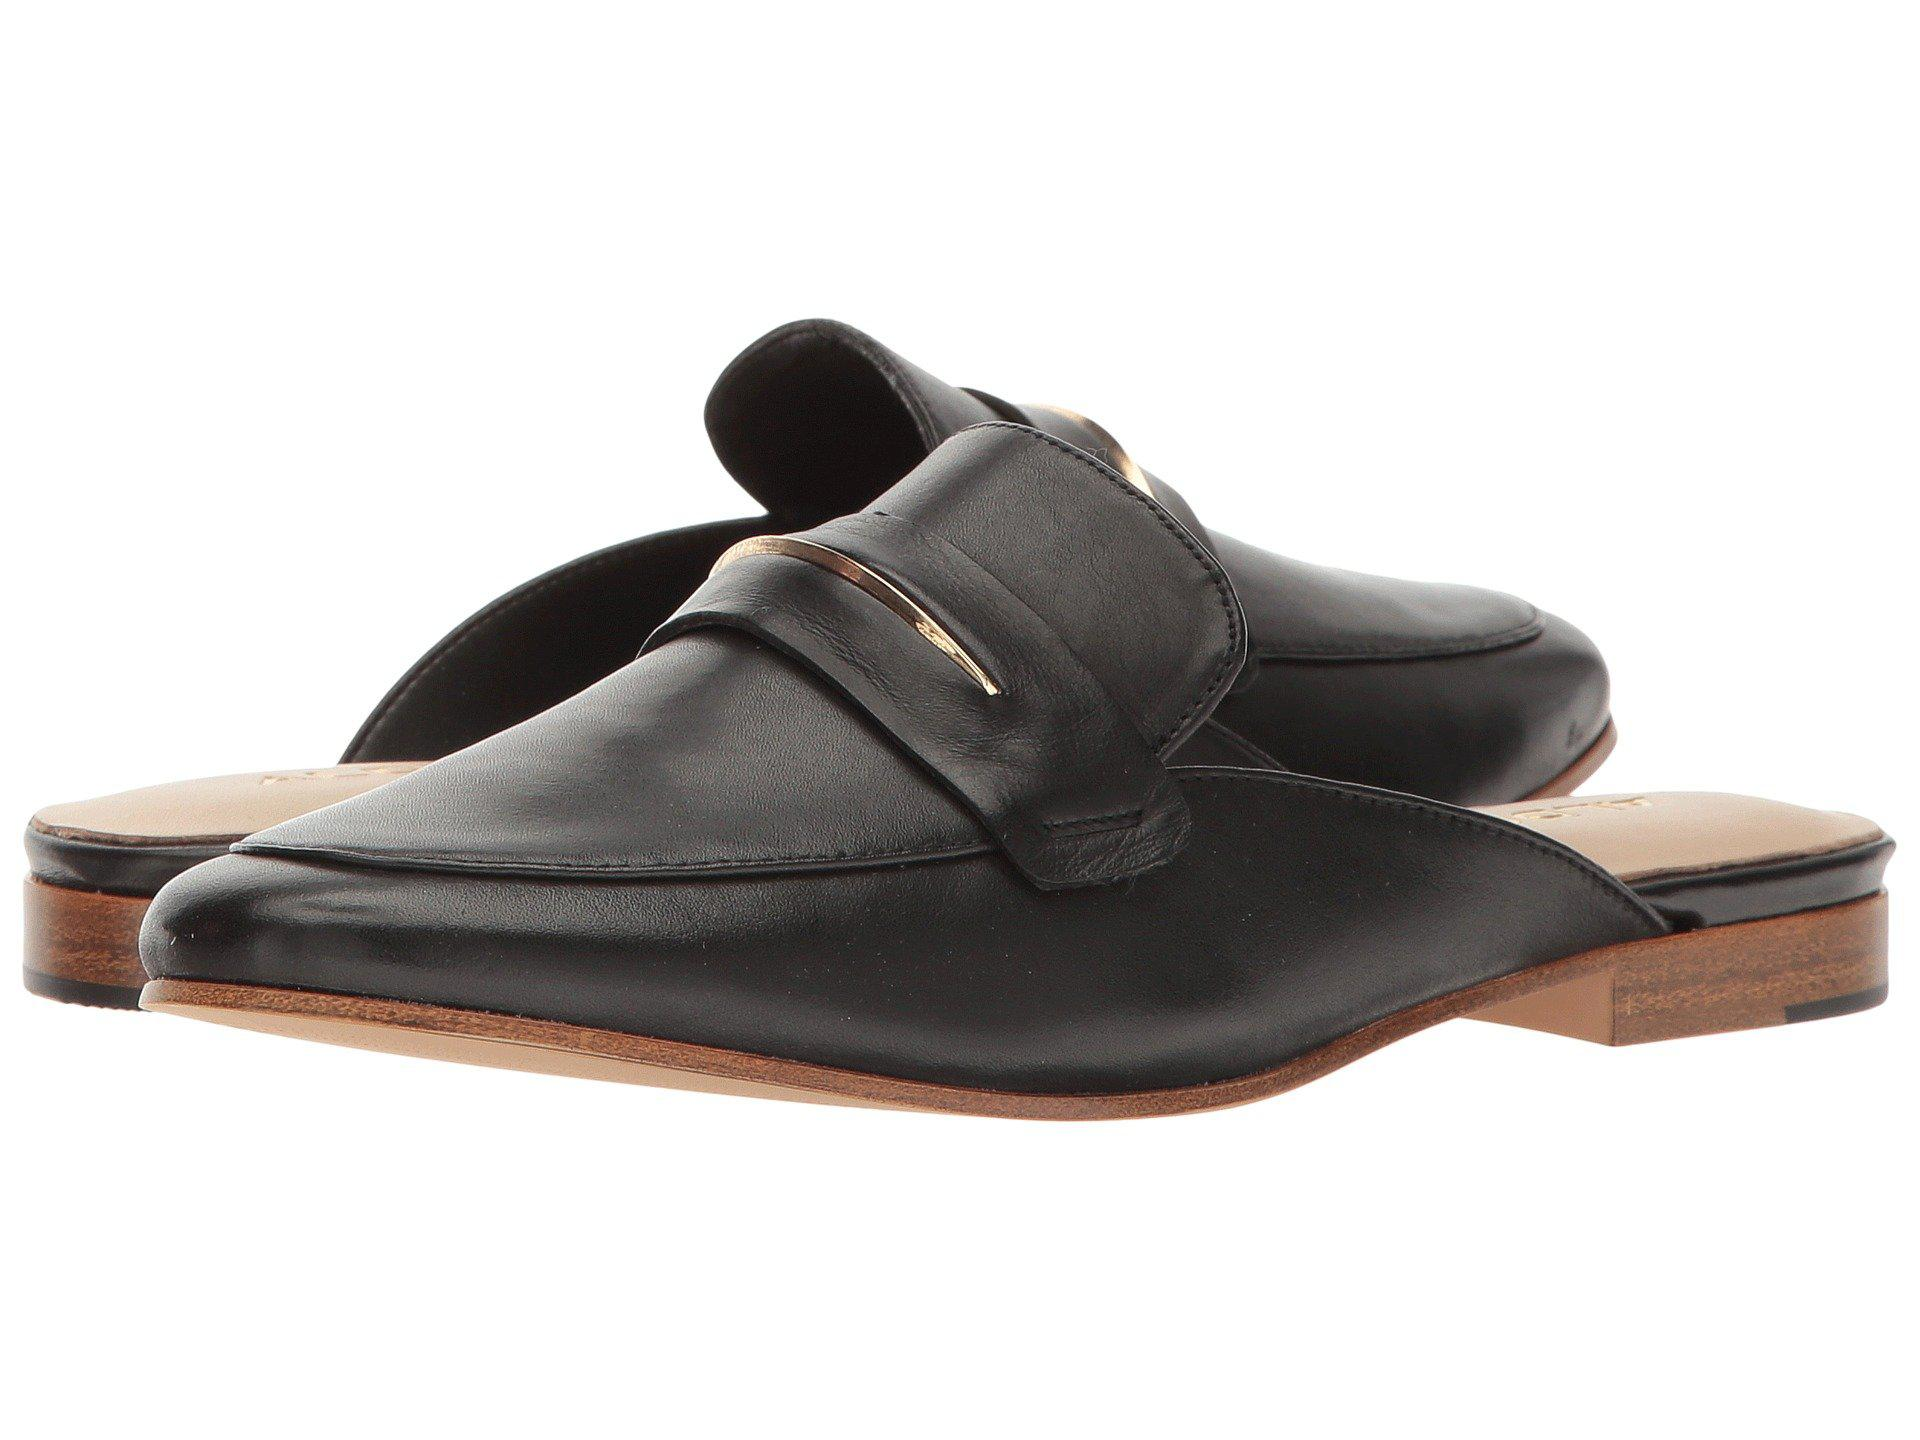 Aldo Womens Shahan Leather Almond Toe Mules Black Leather Size 6.5